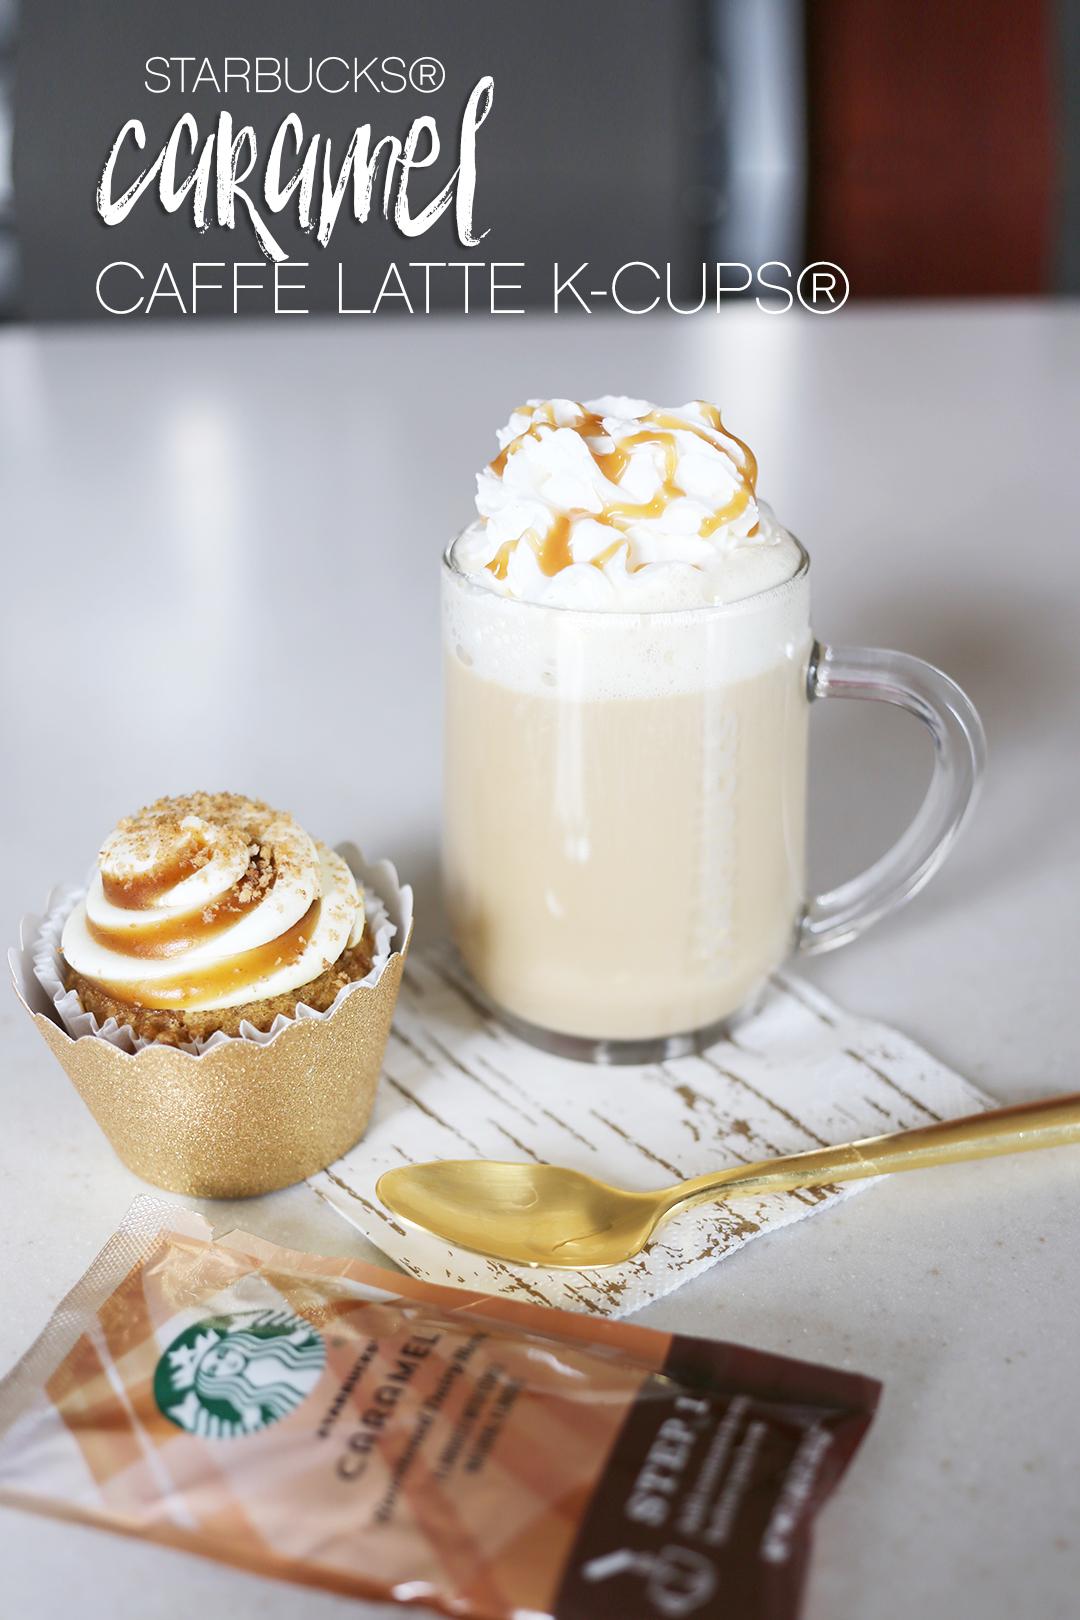 starbucks-caramel-caffe-latte-k-cups